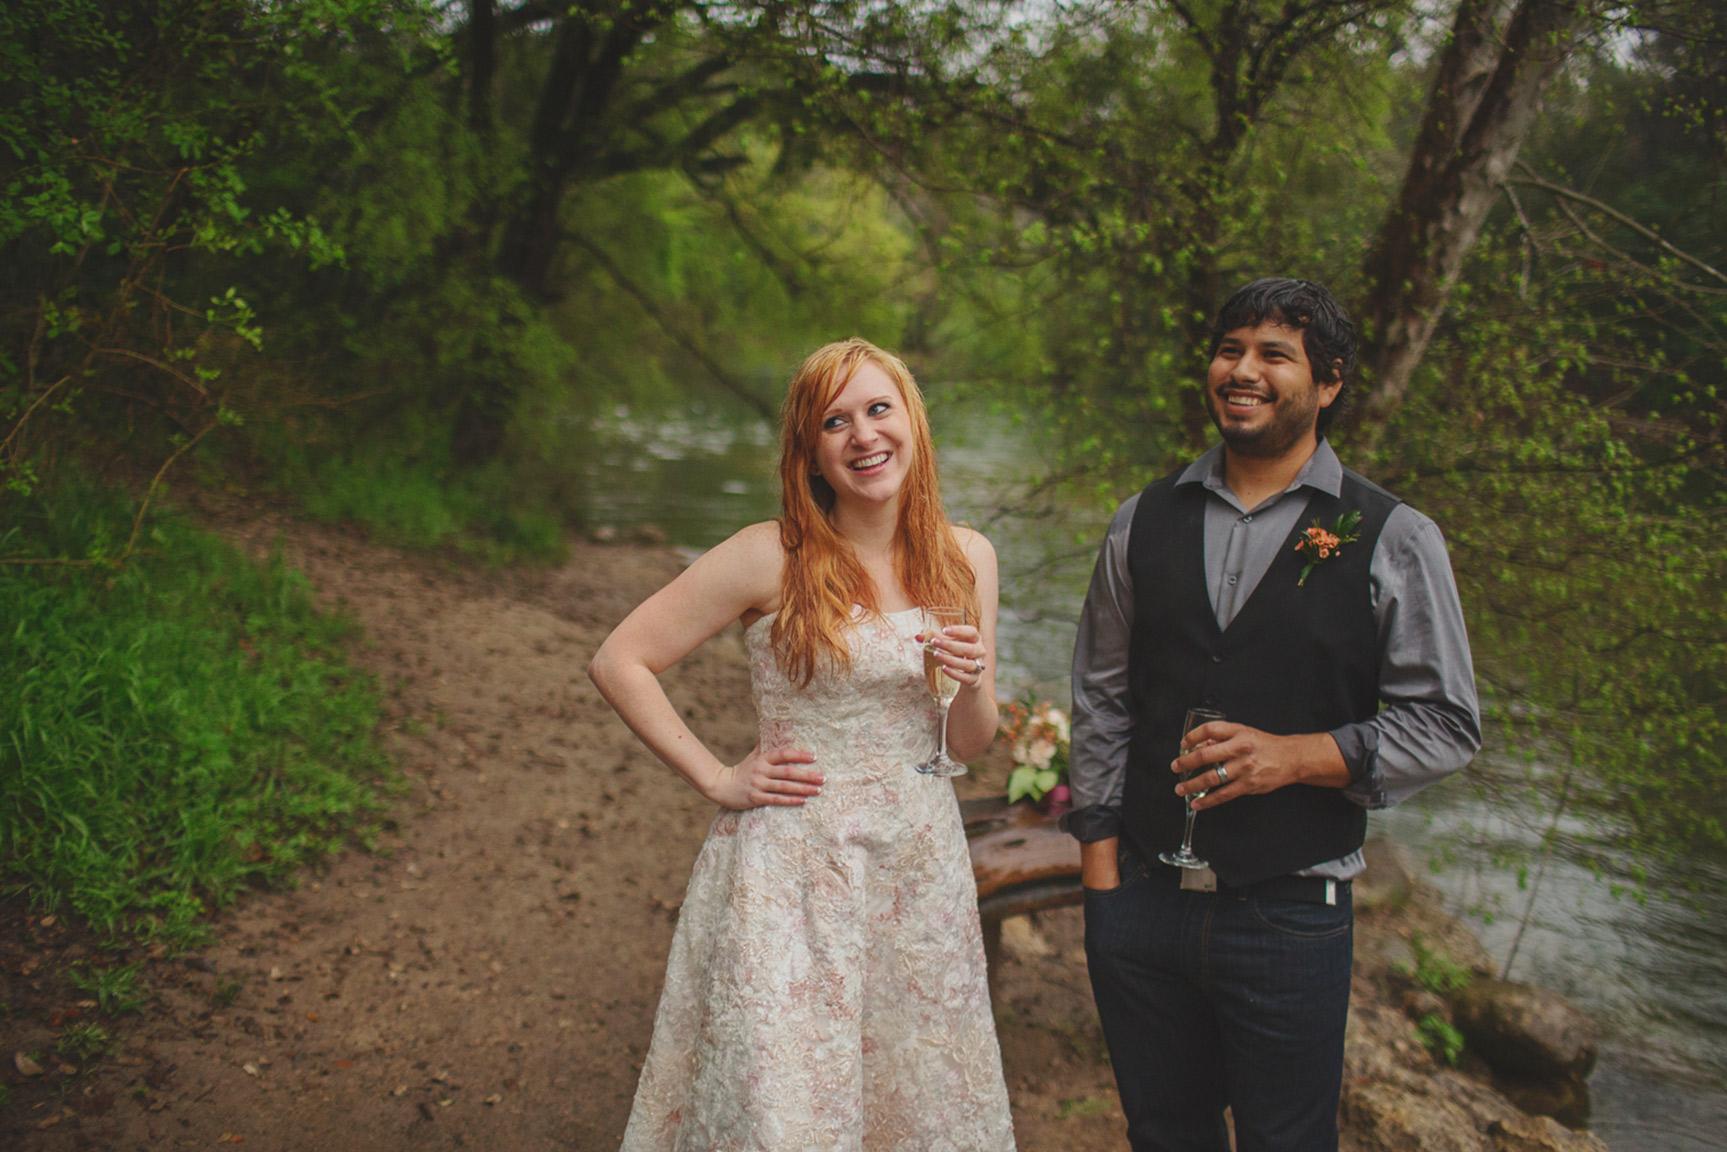 PhotobyBetsy-elopement034.jpg